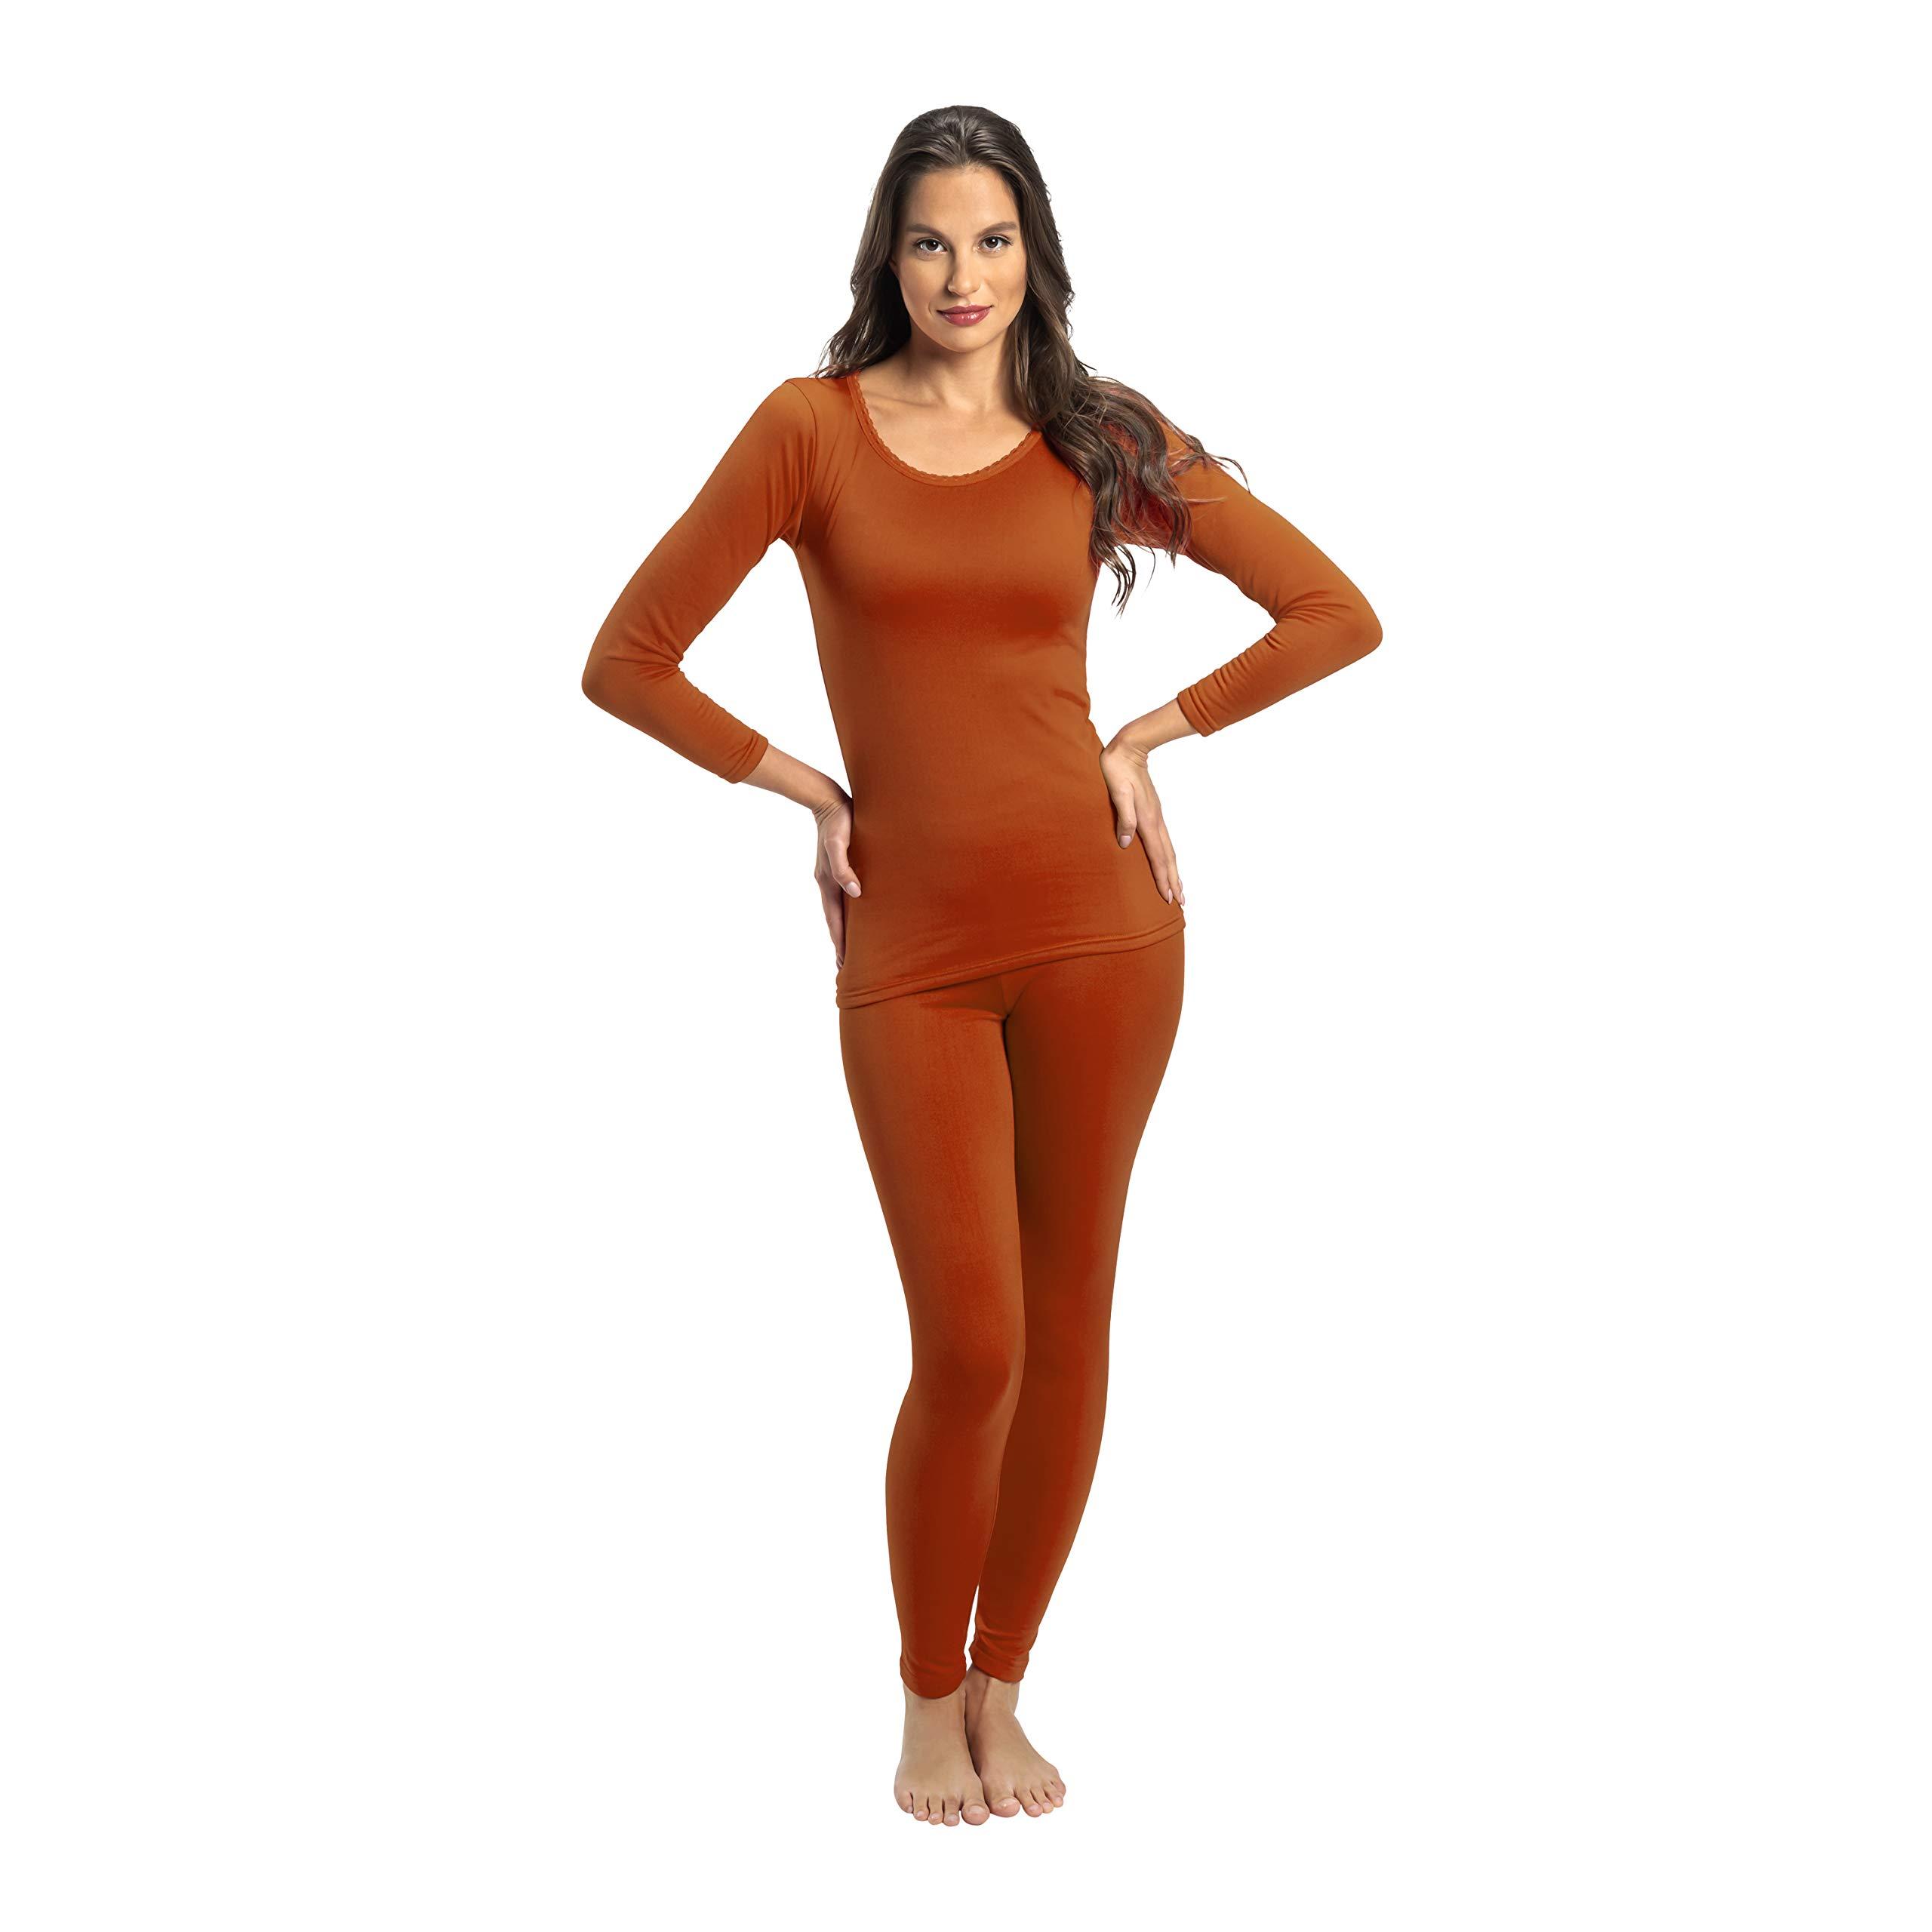 Rocky Thermal Underwear for Women Fleece Lined Thermals Women's Base Layer Long John Set Rust by Rocky